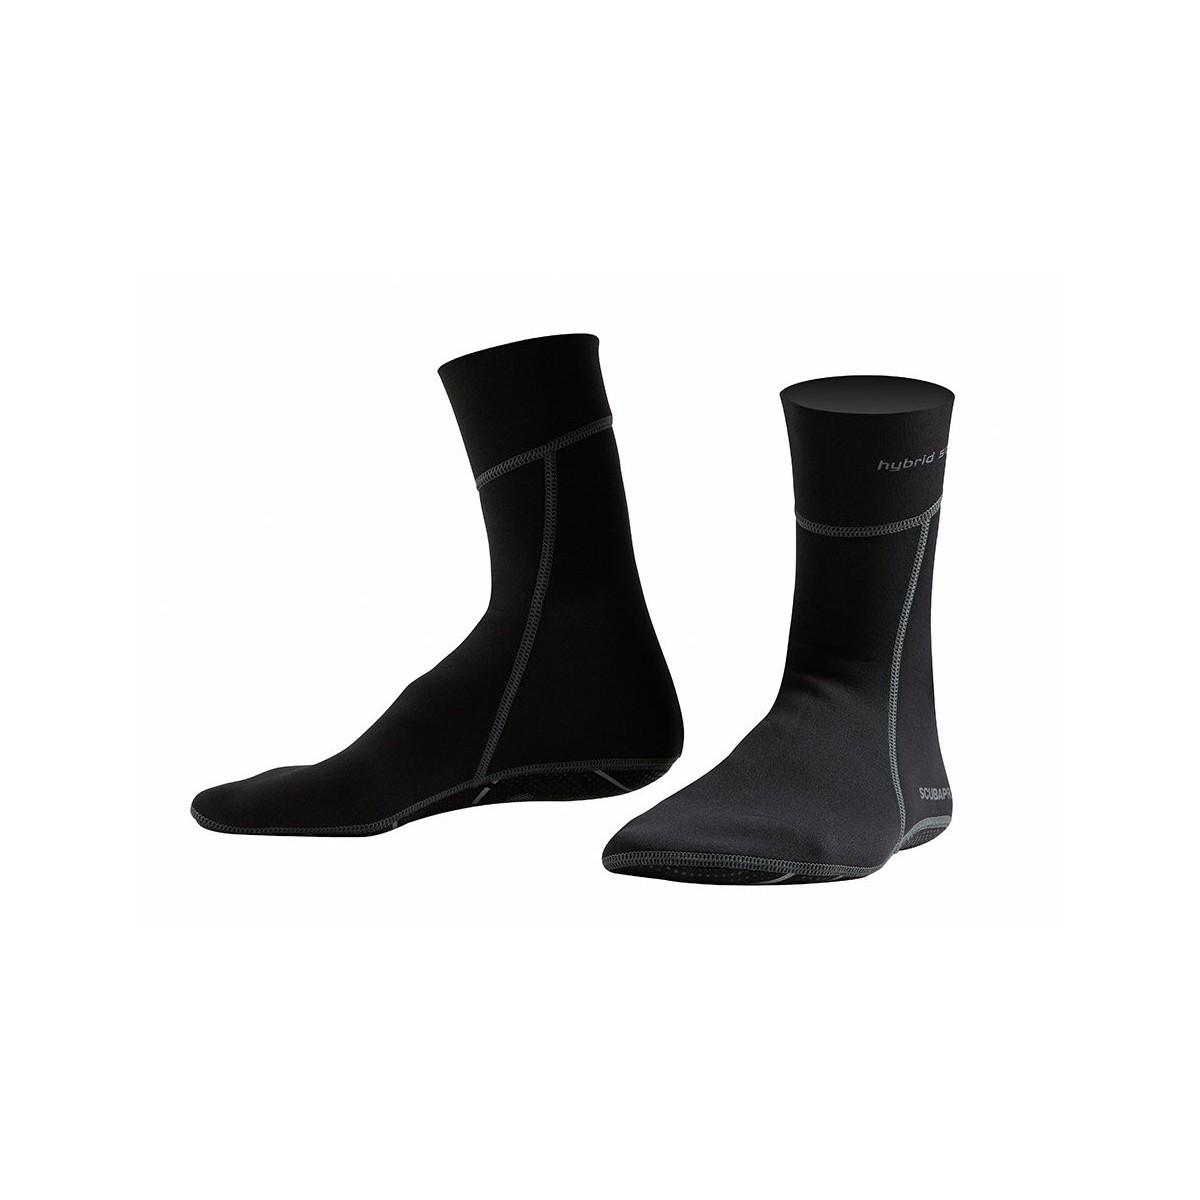 ScubaPro Hybrid Socks 2.5 mm